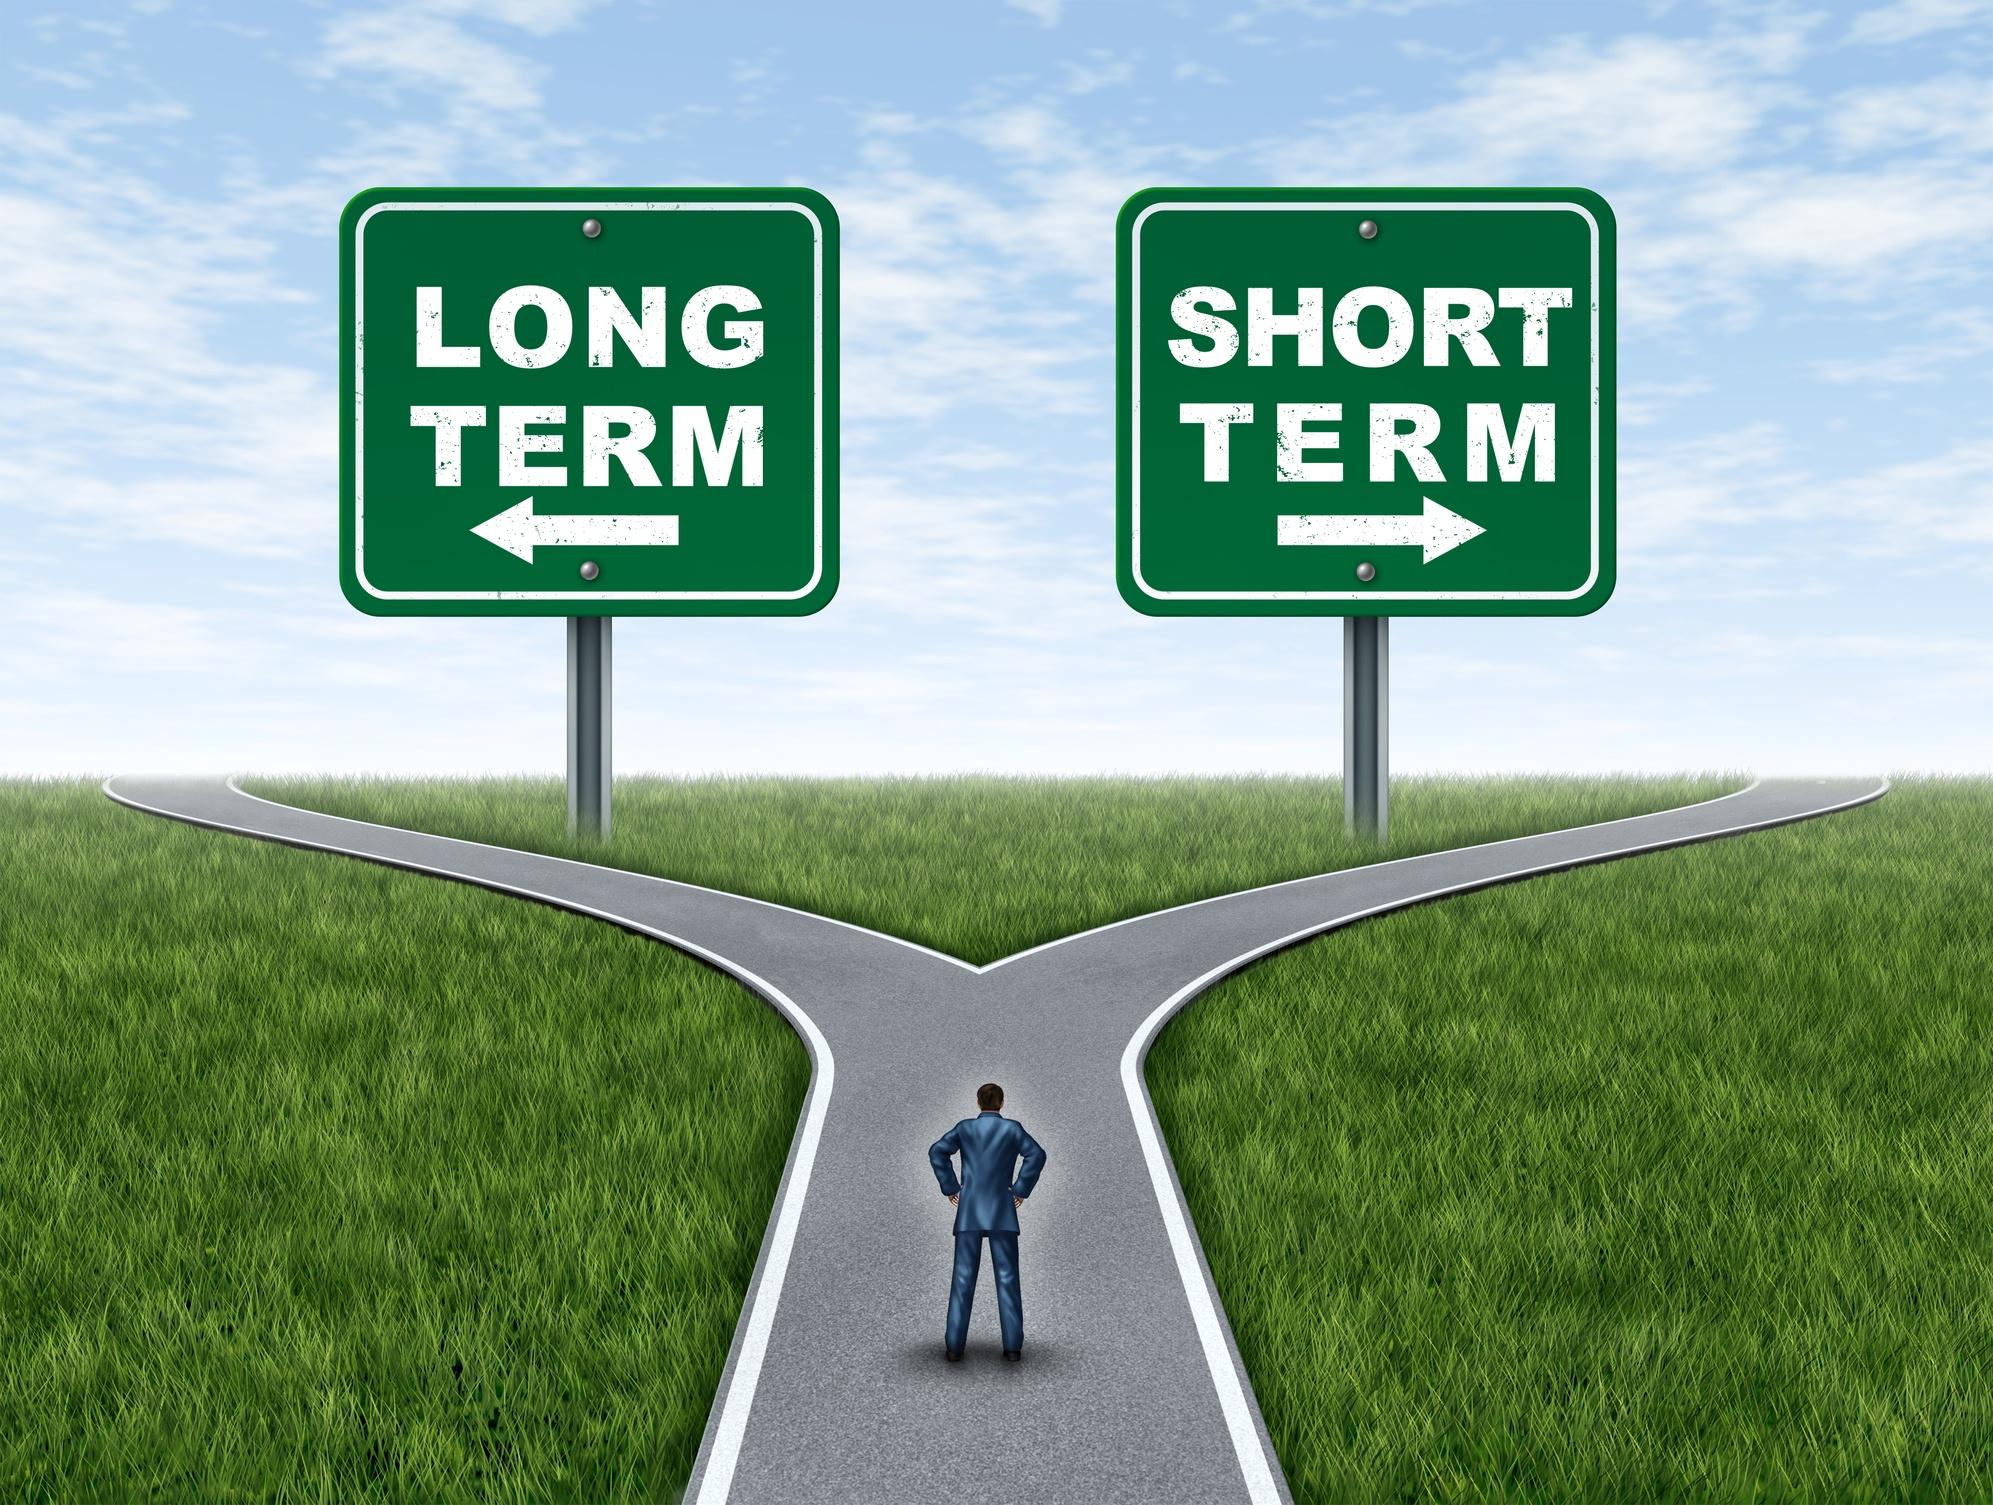 short-term-long-term-goals-every-restaurant-owner-should-aim-for